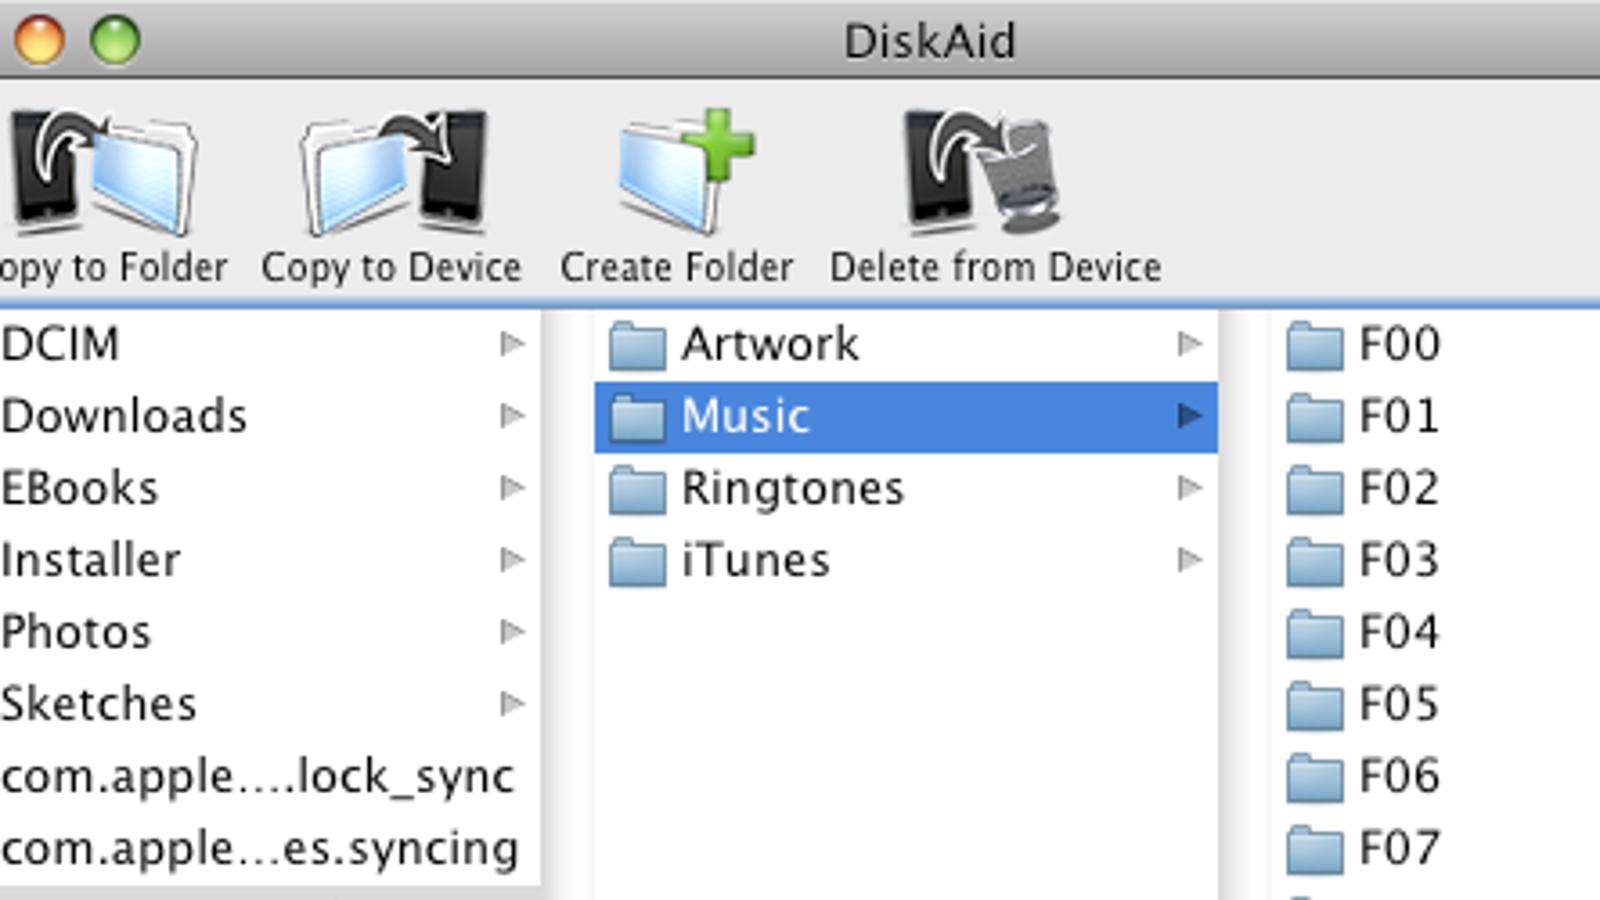 DiskAid Free Download for Windows 10 7 8/ (64 bit/32 bit)